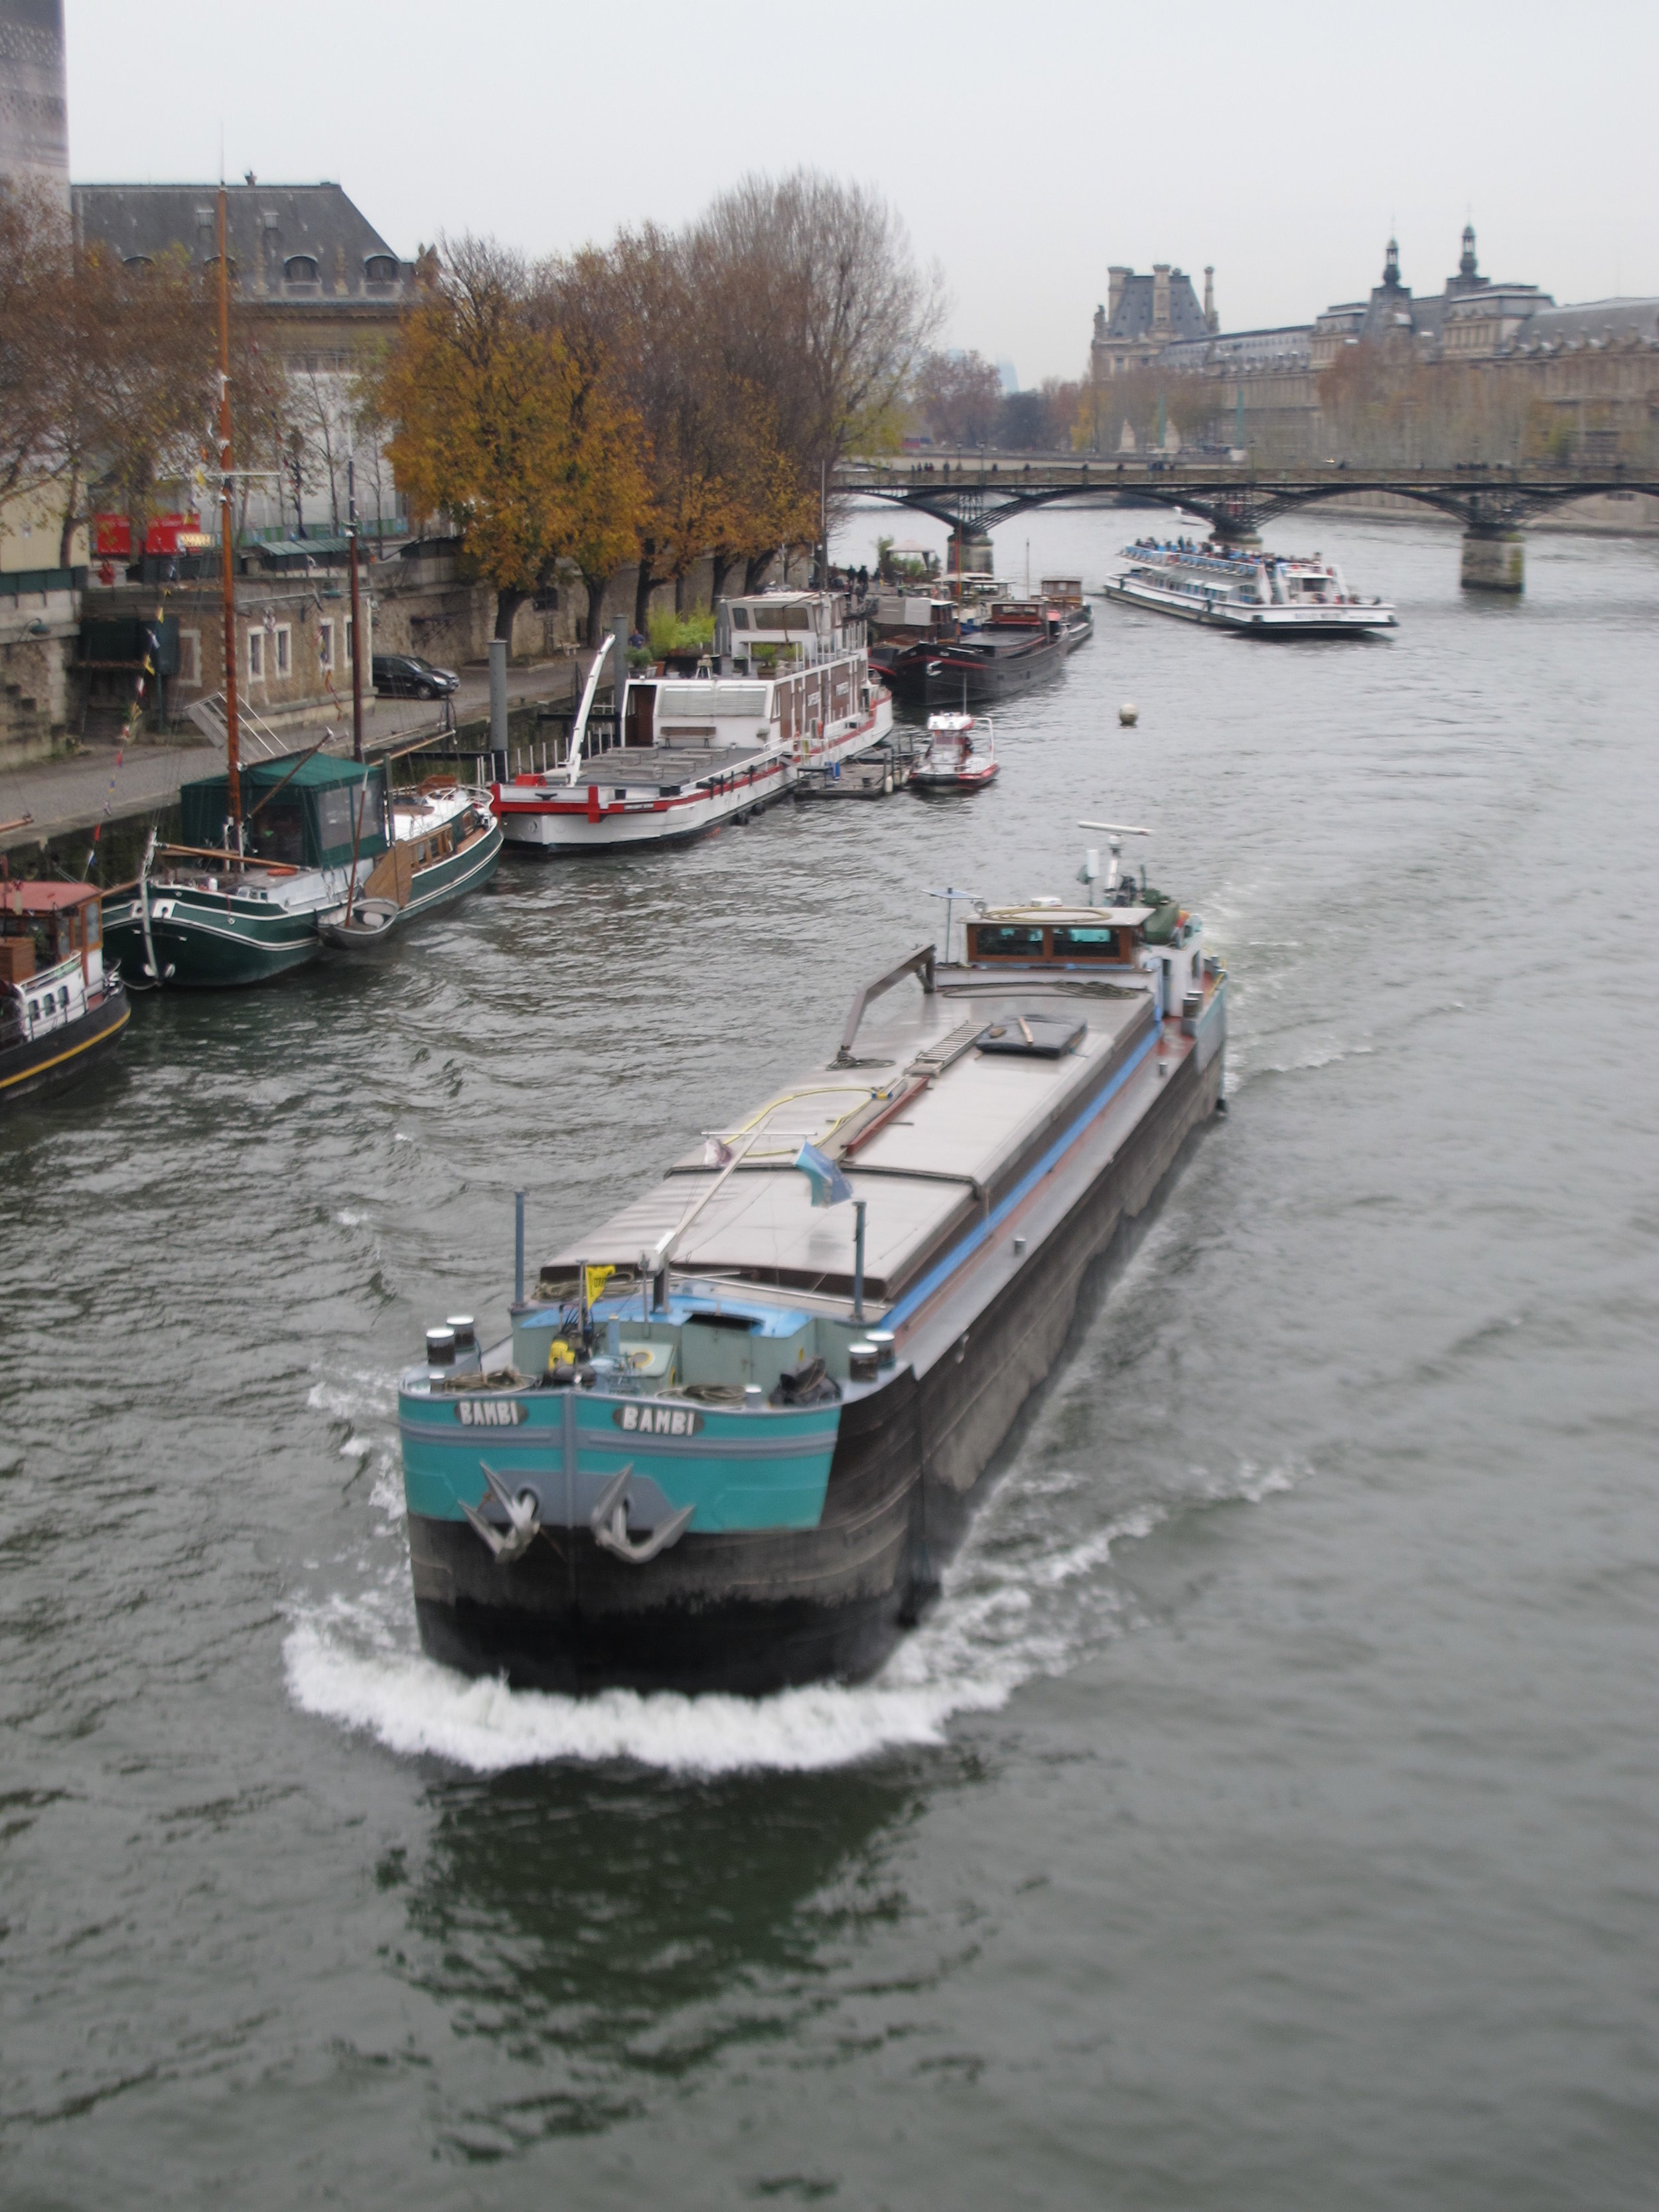 Peniche barge on the Seine Paris.JPG